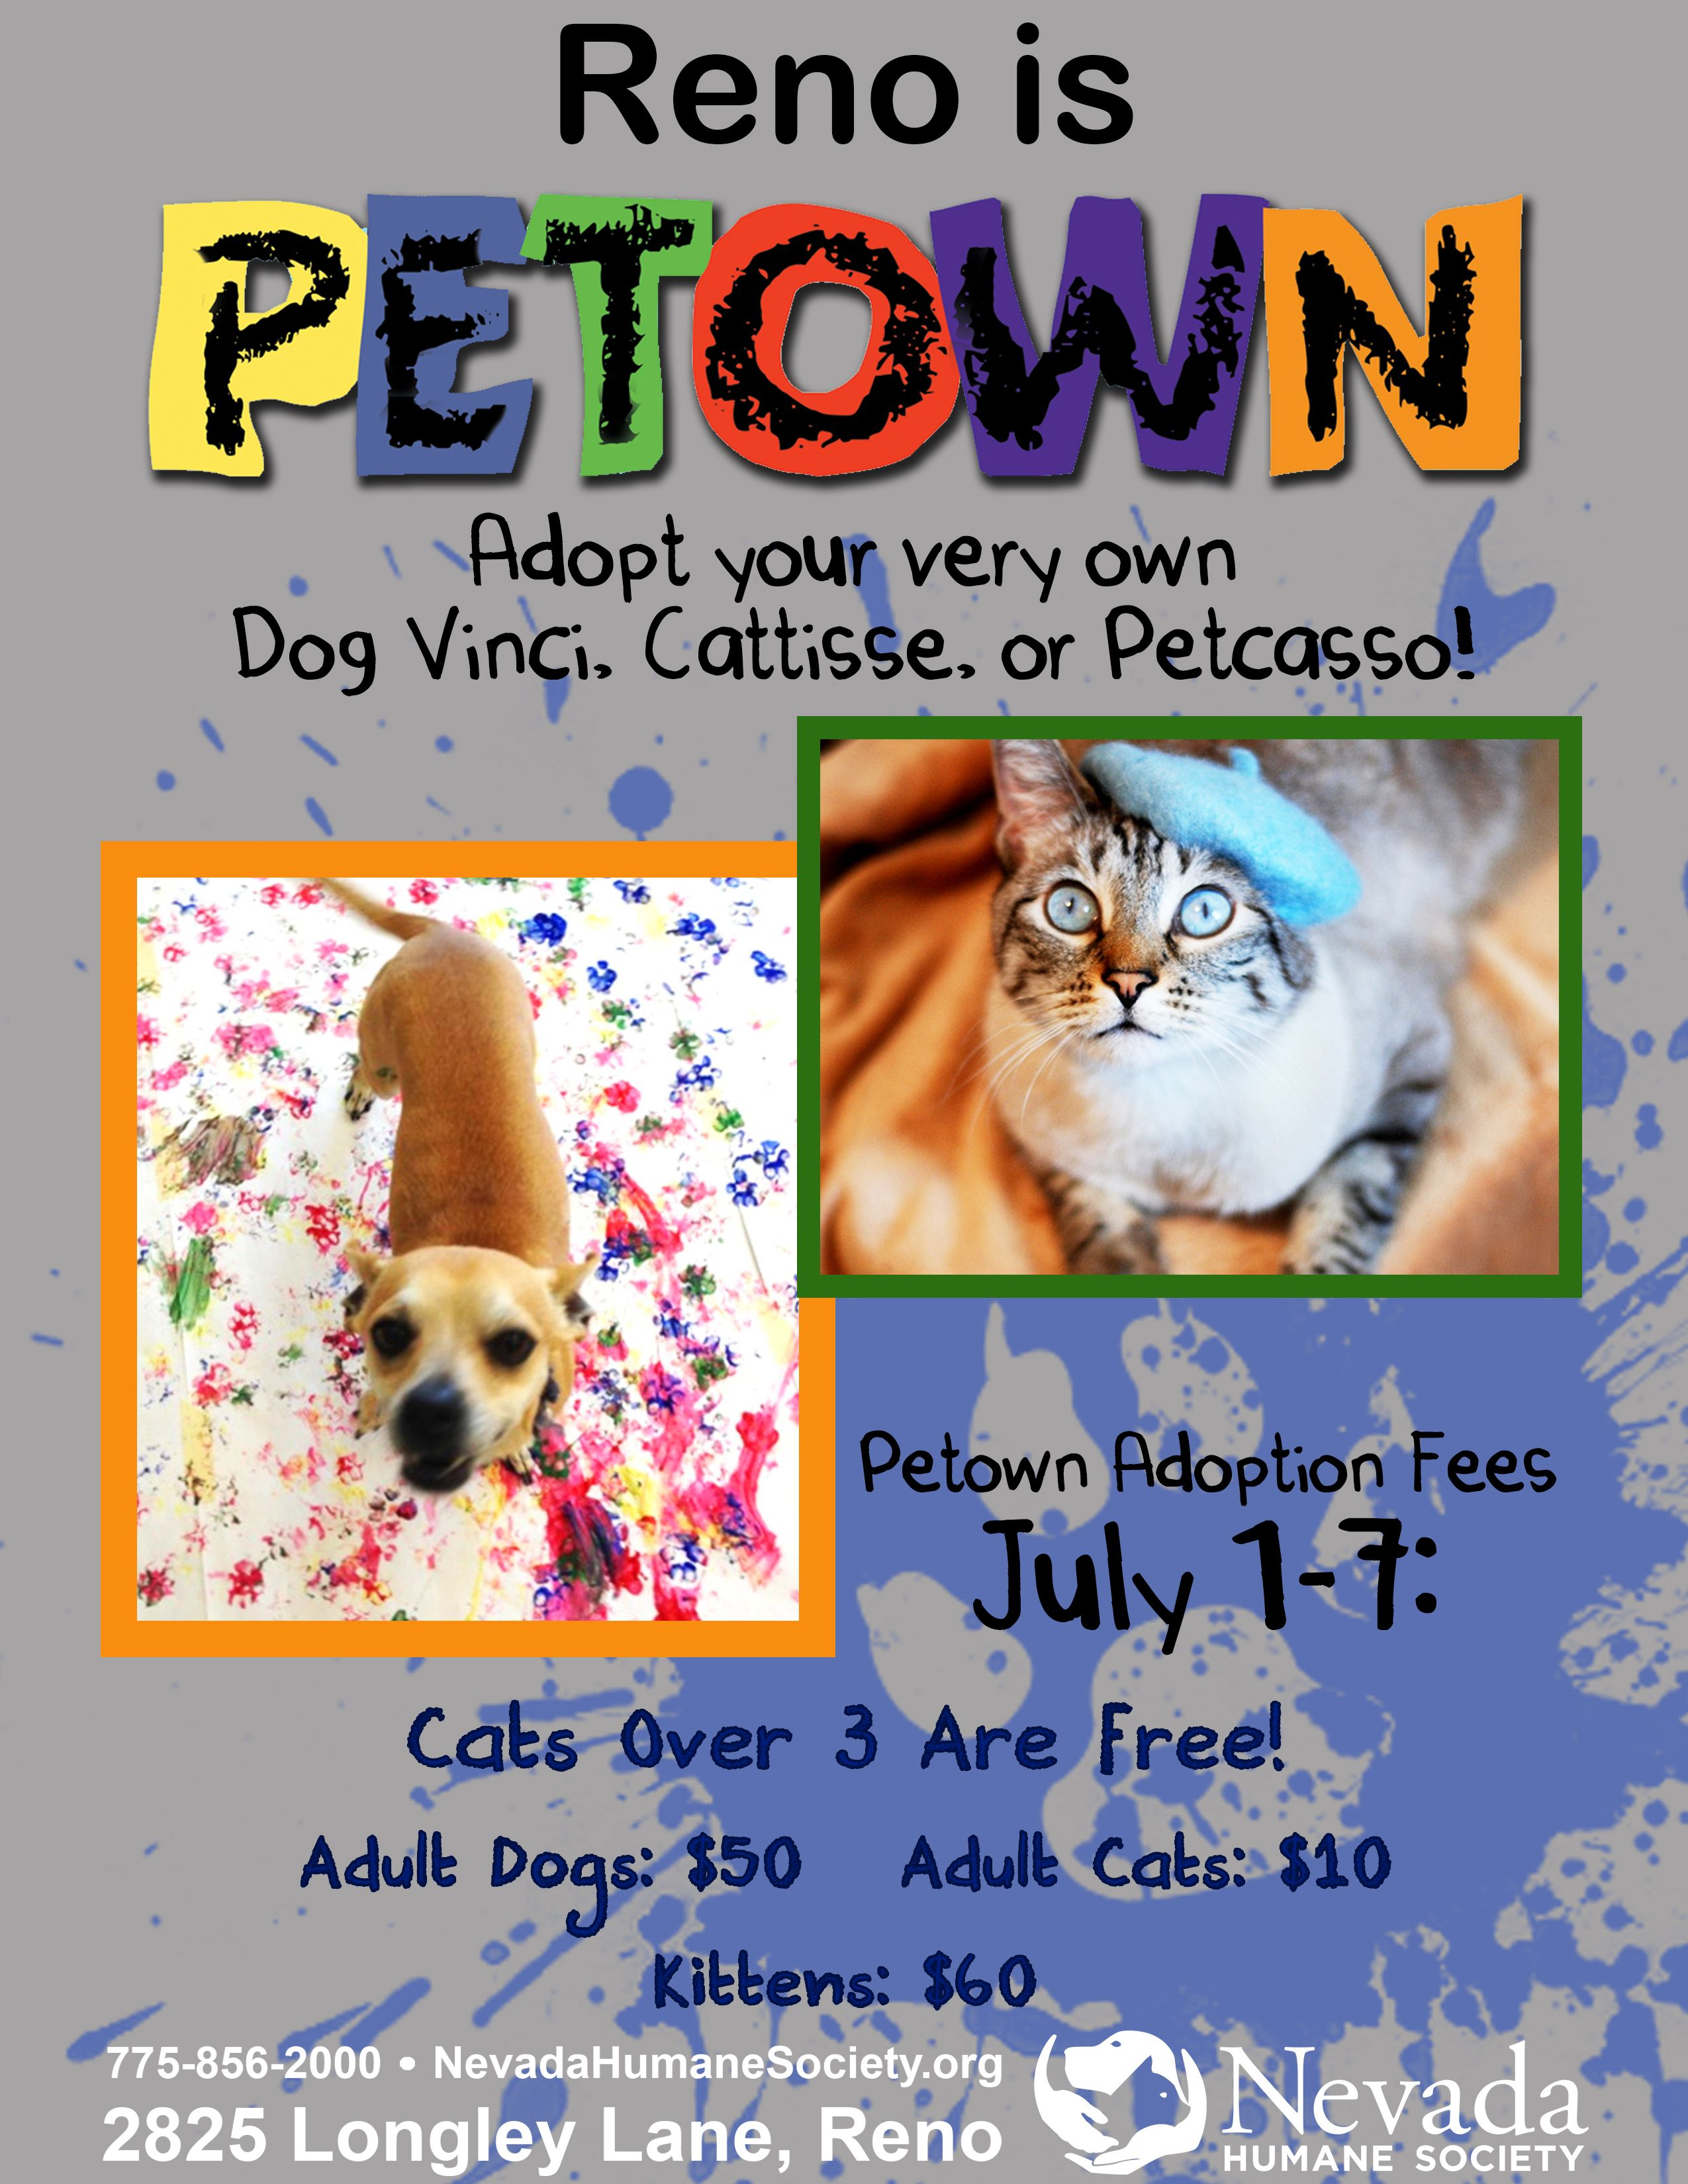 Based off Reno's Artown, Nevada Humane Society came up